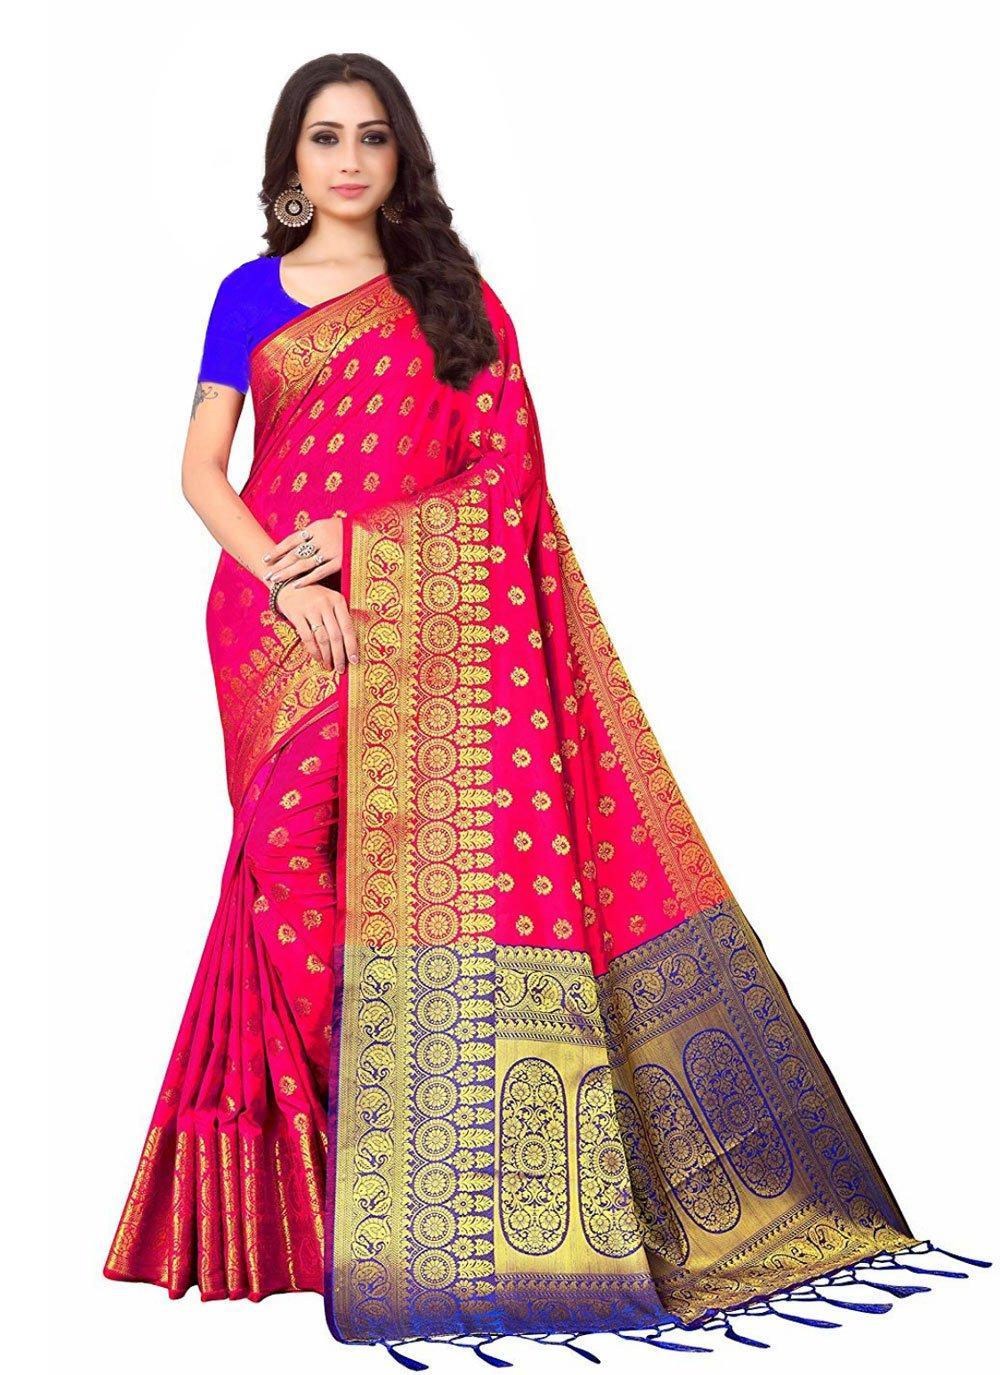 Rani Color Designer Saree